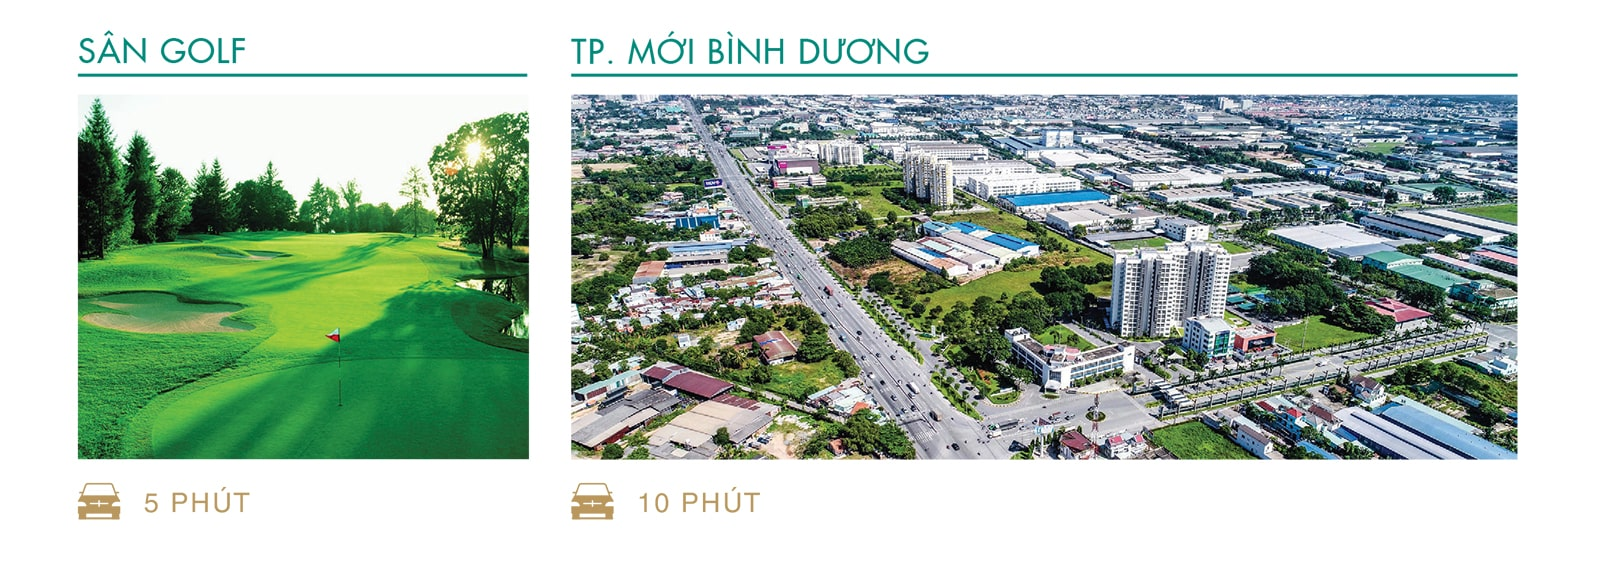 tien-ich-ngoai-khu-02-min